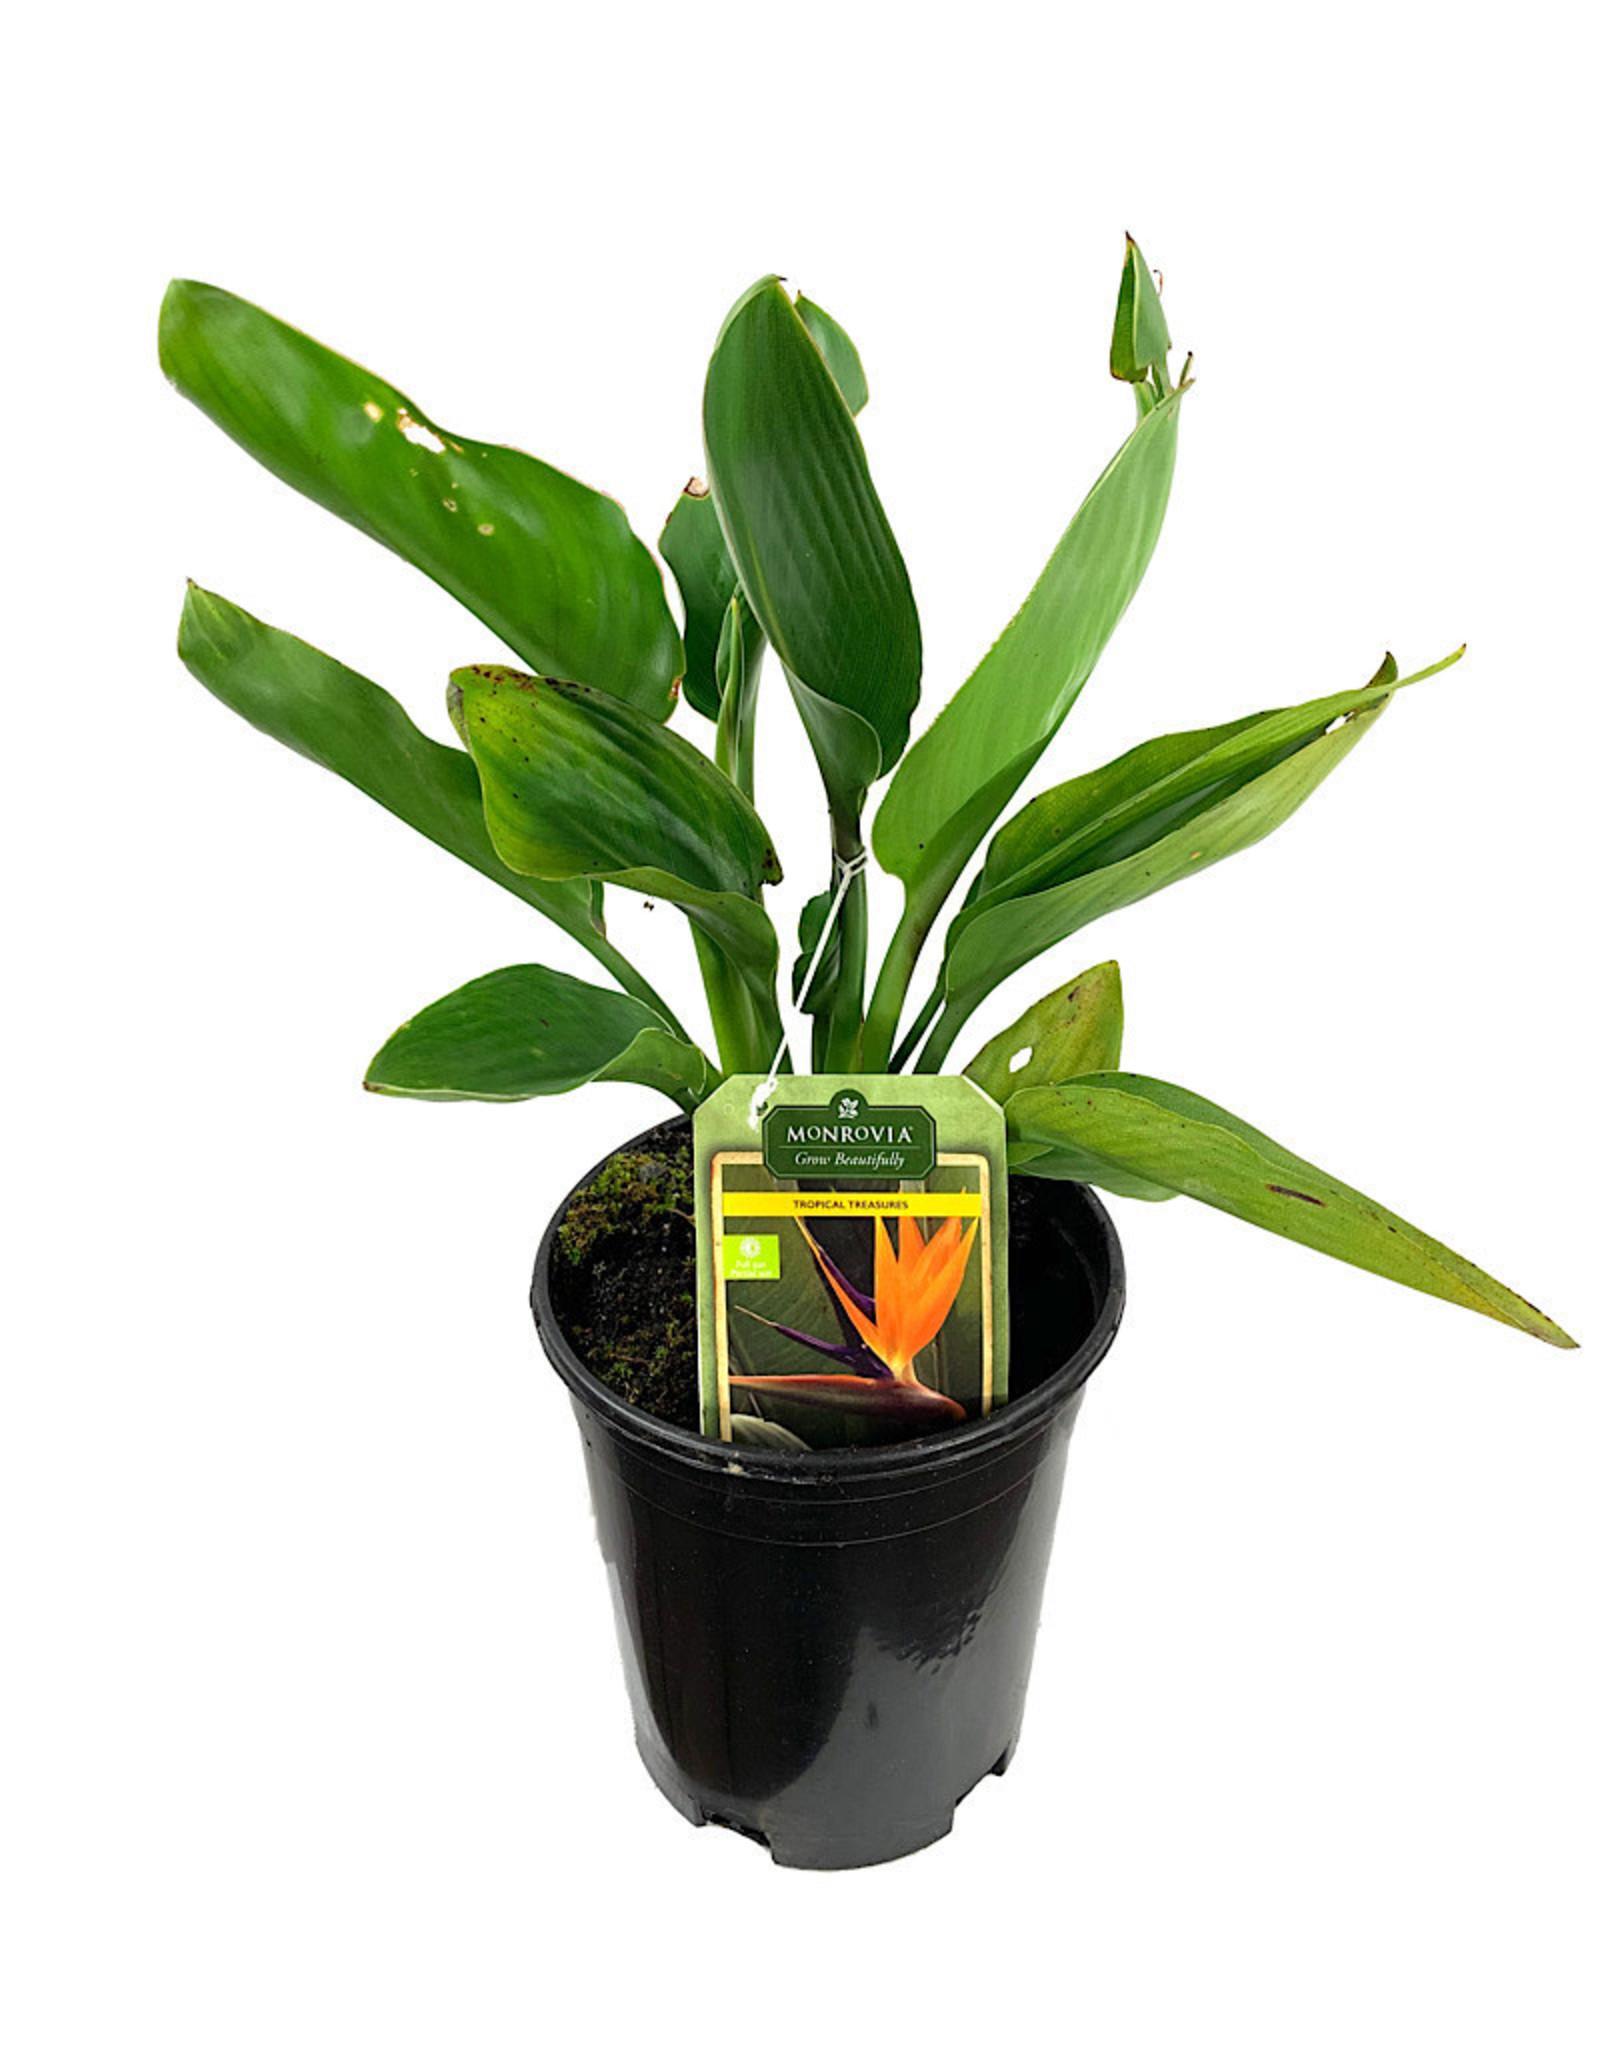 Strelitzia reginae 1 Gallon